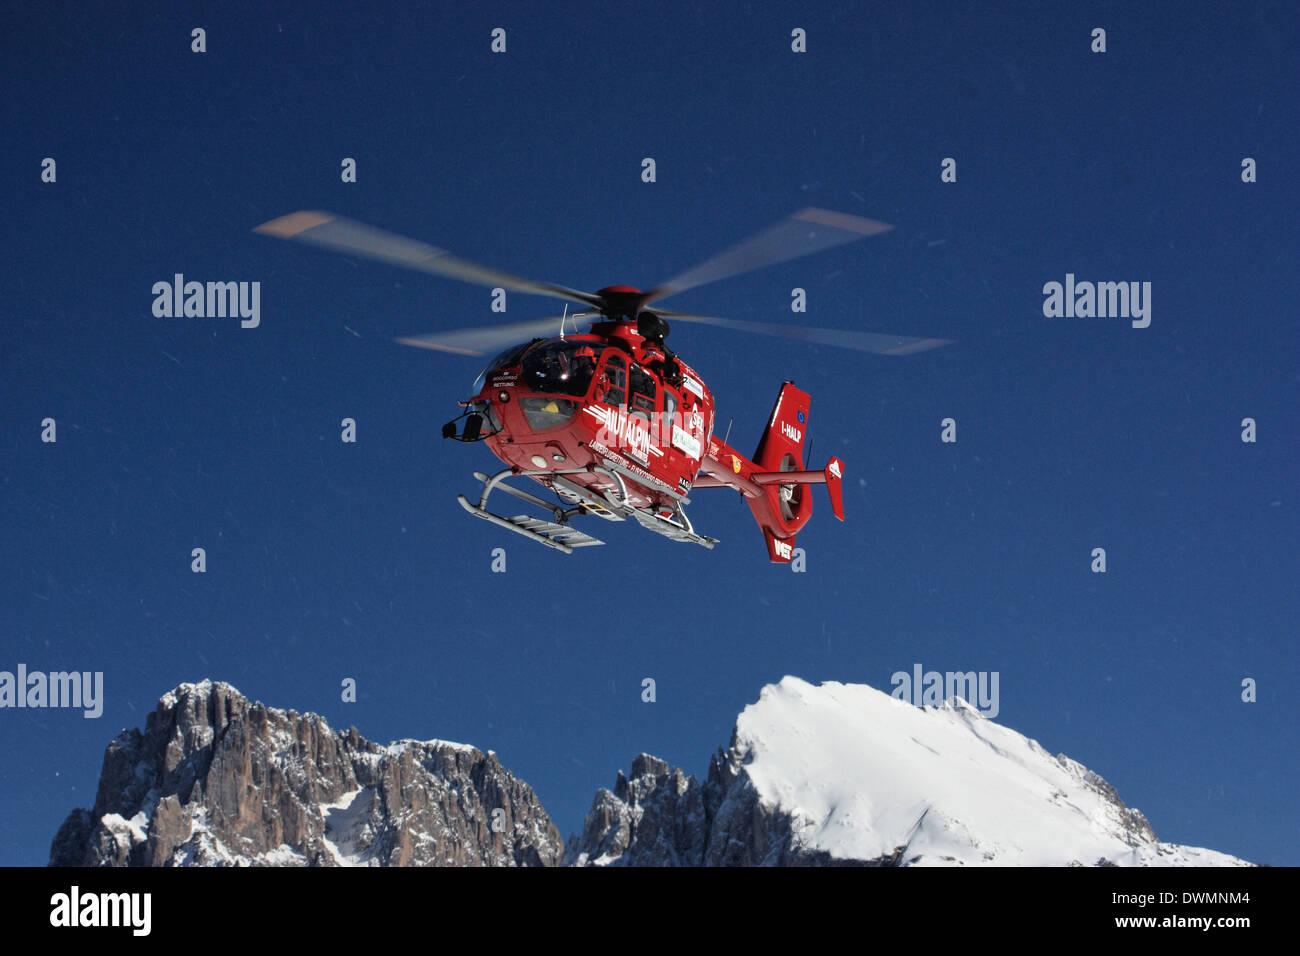 'Aiut Alpin Dolomites' heli mountain rescue, EUROCOPTER EC 135 T2, Seiser Alm / Alpe di Siusi, South Tyrol, Italy - Stock Image